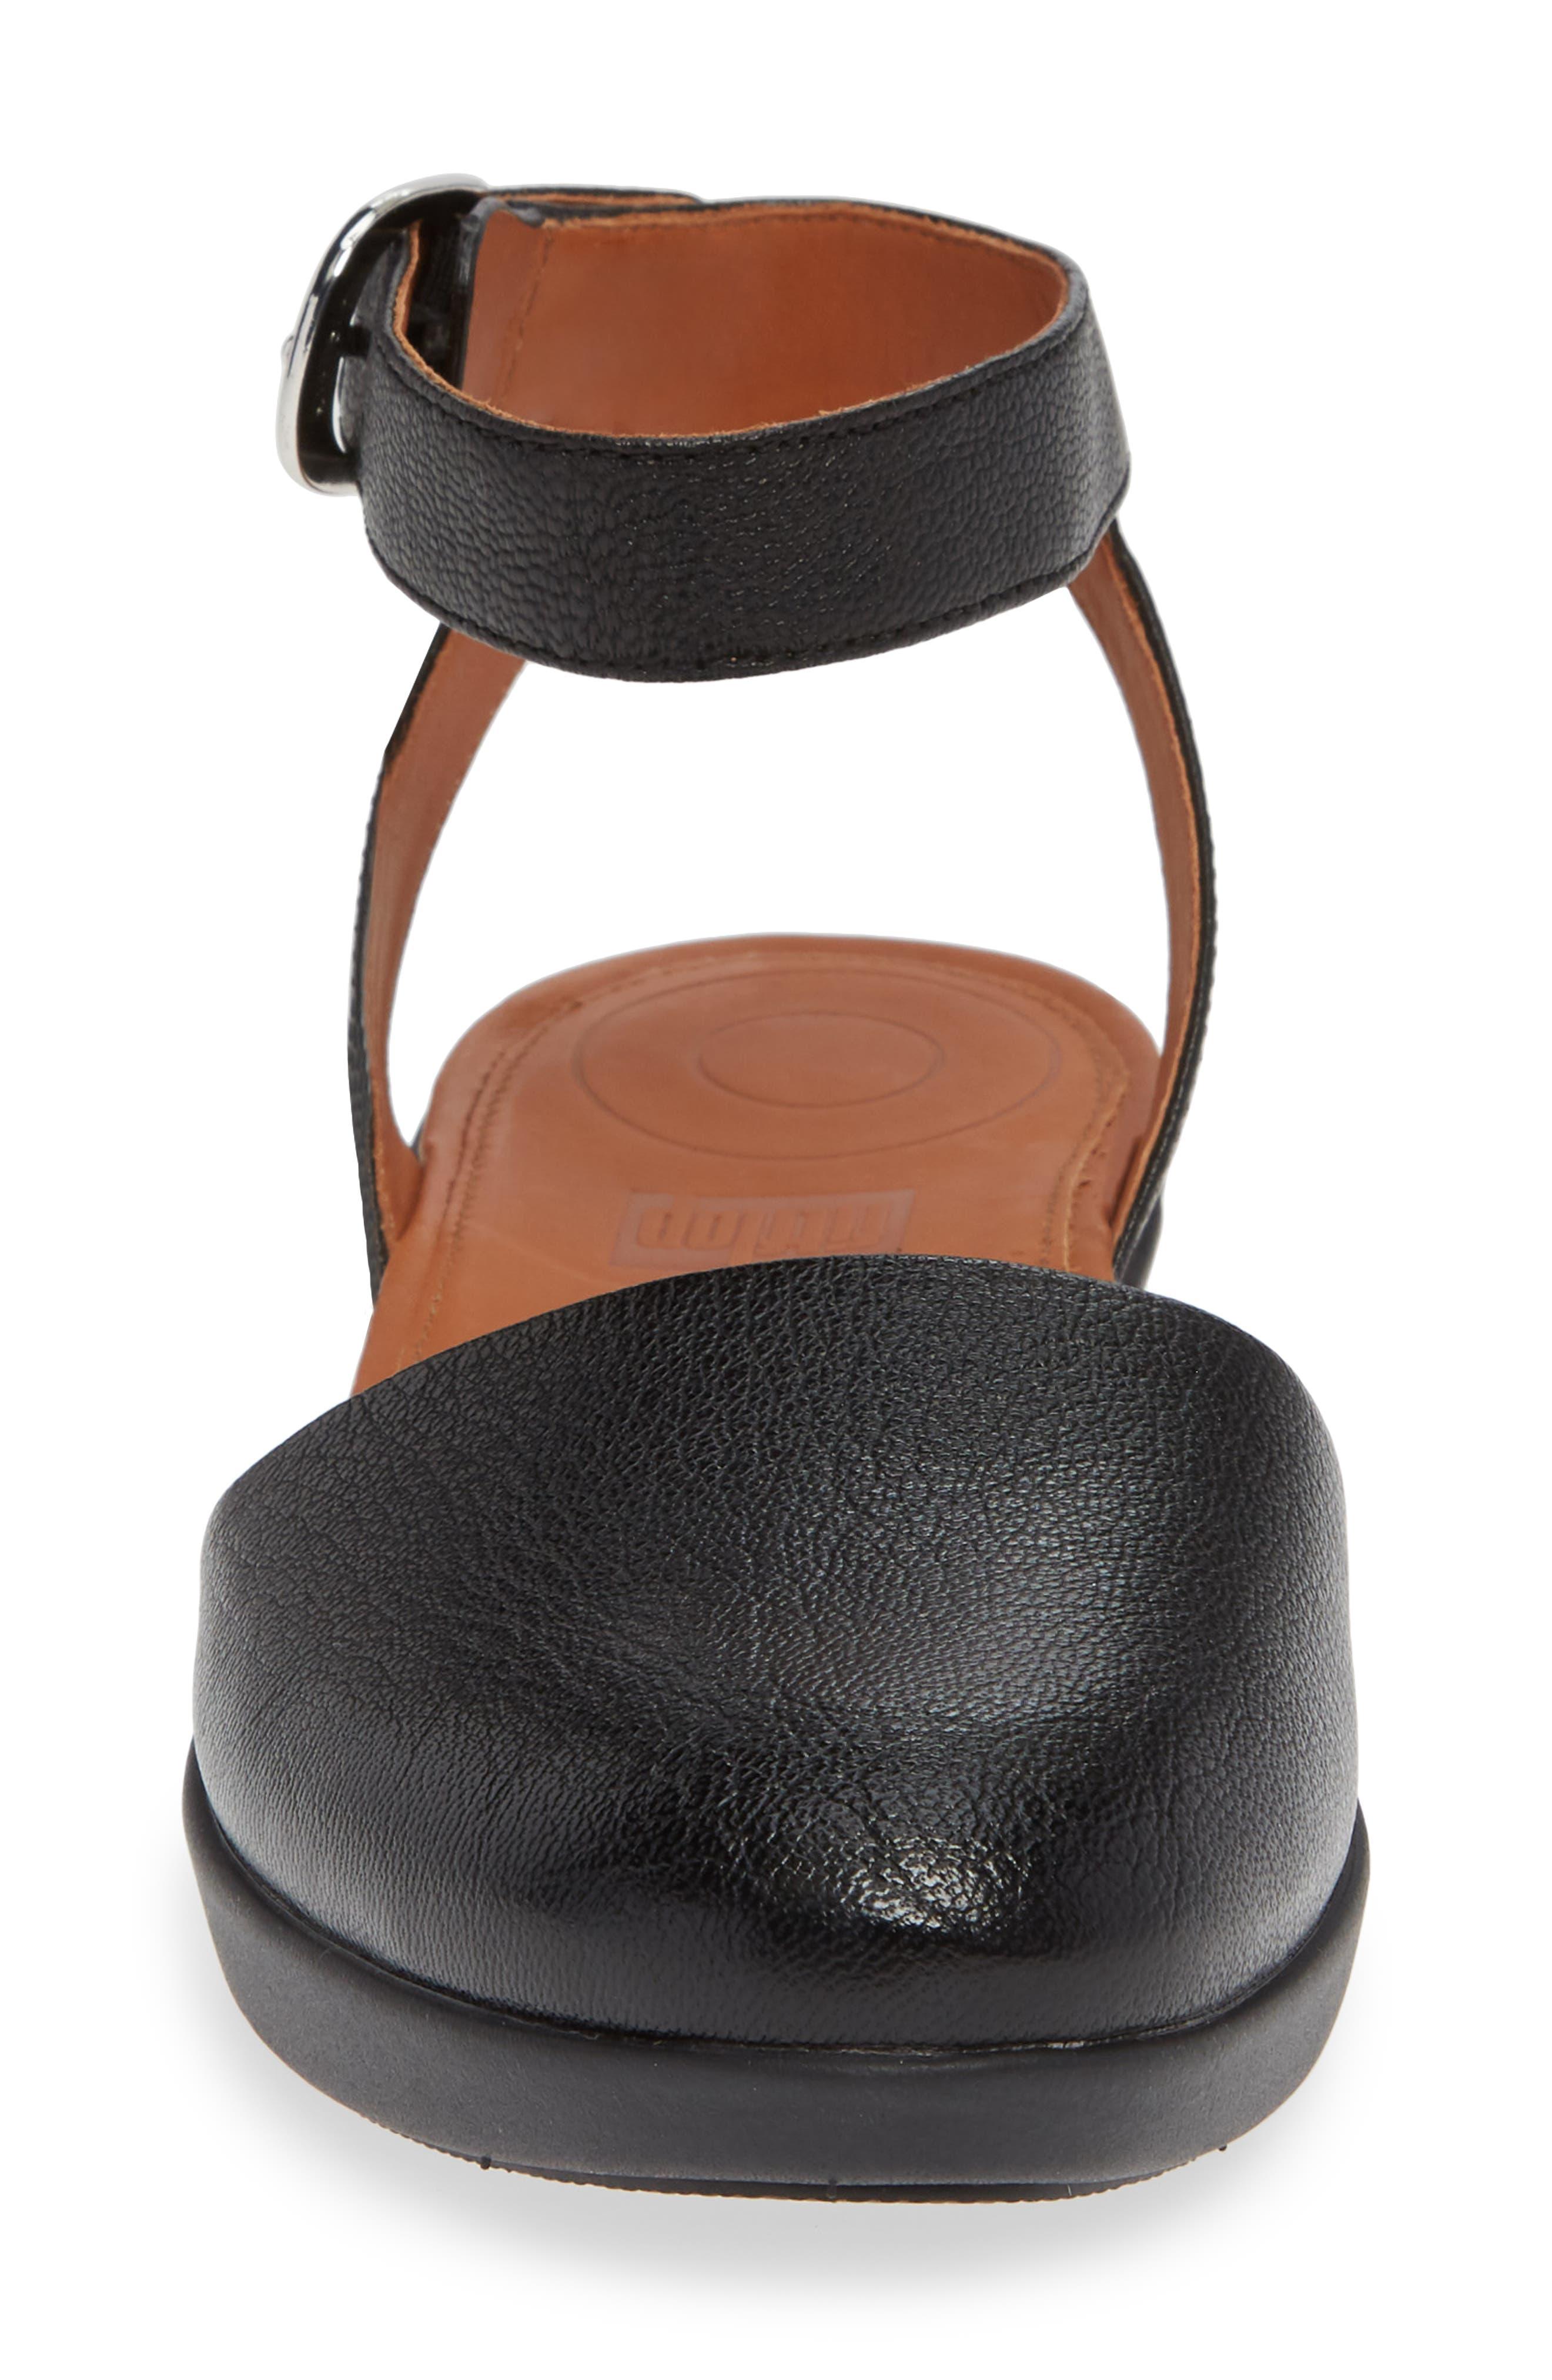 Cova Ankle Strap Sandal,                             Alternate thumbnail 4, color,                             BLACK LEATHER